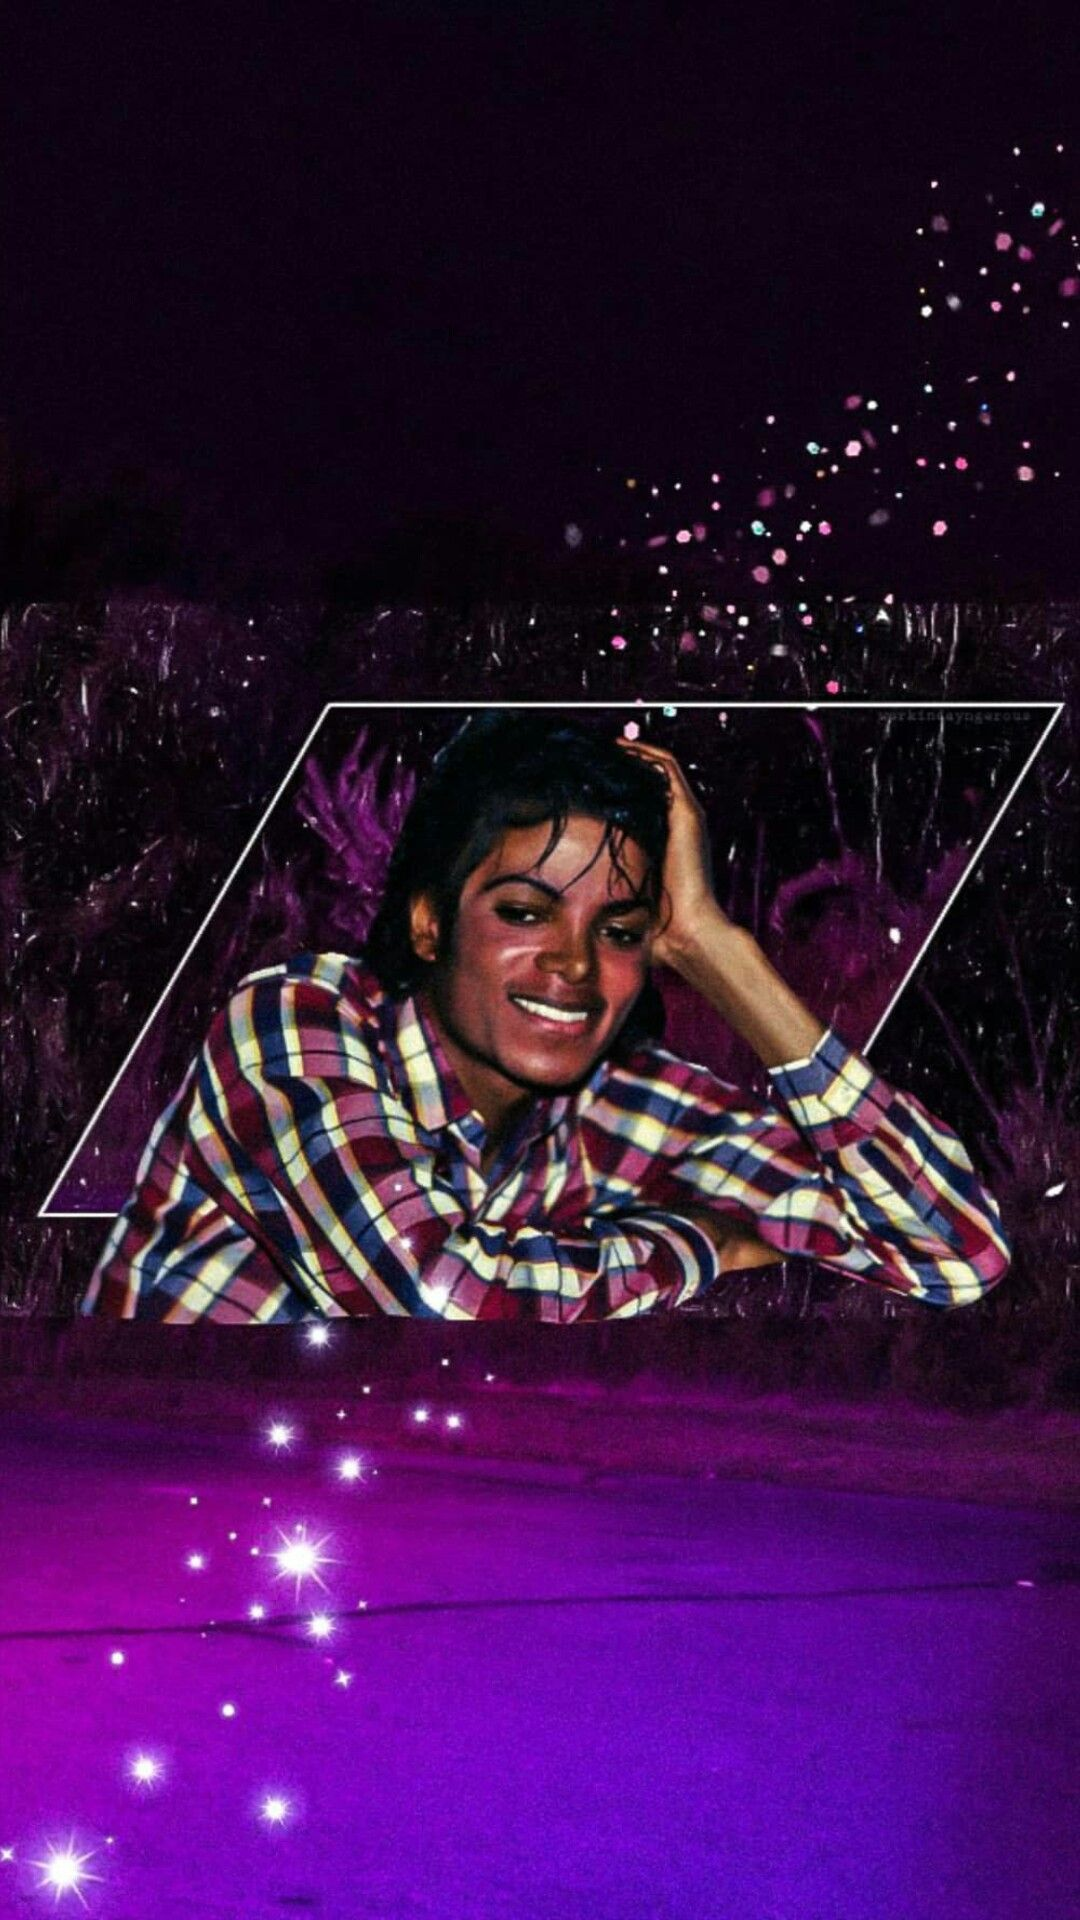 Michael Jackson Wallpaper Iphone in 2020 Michael jackson